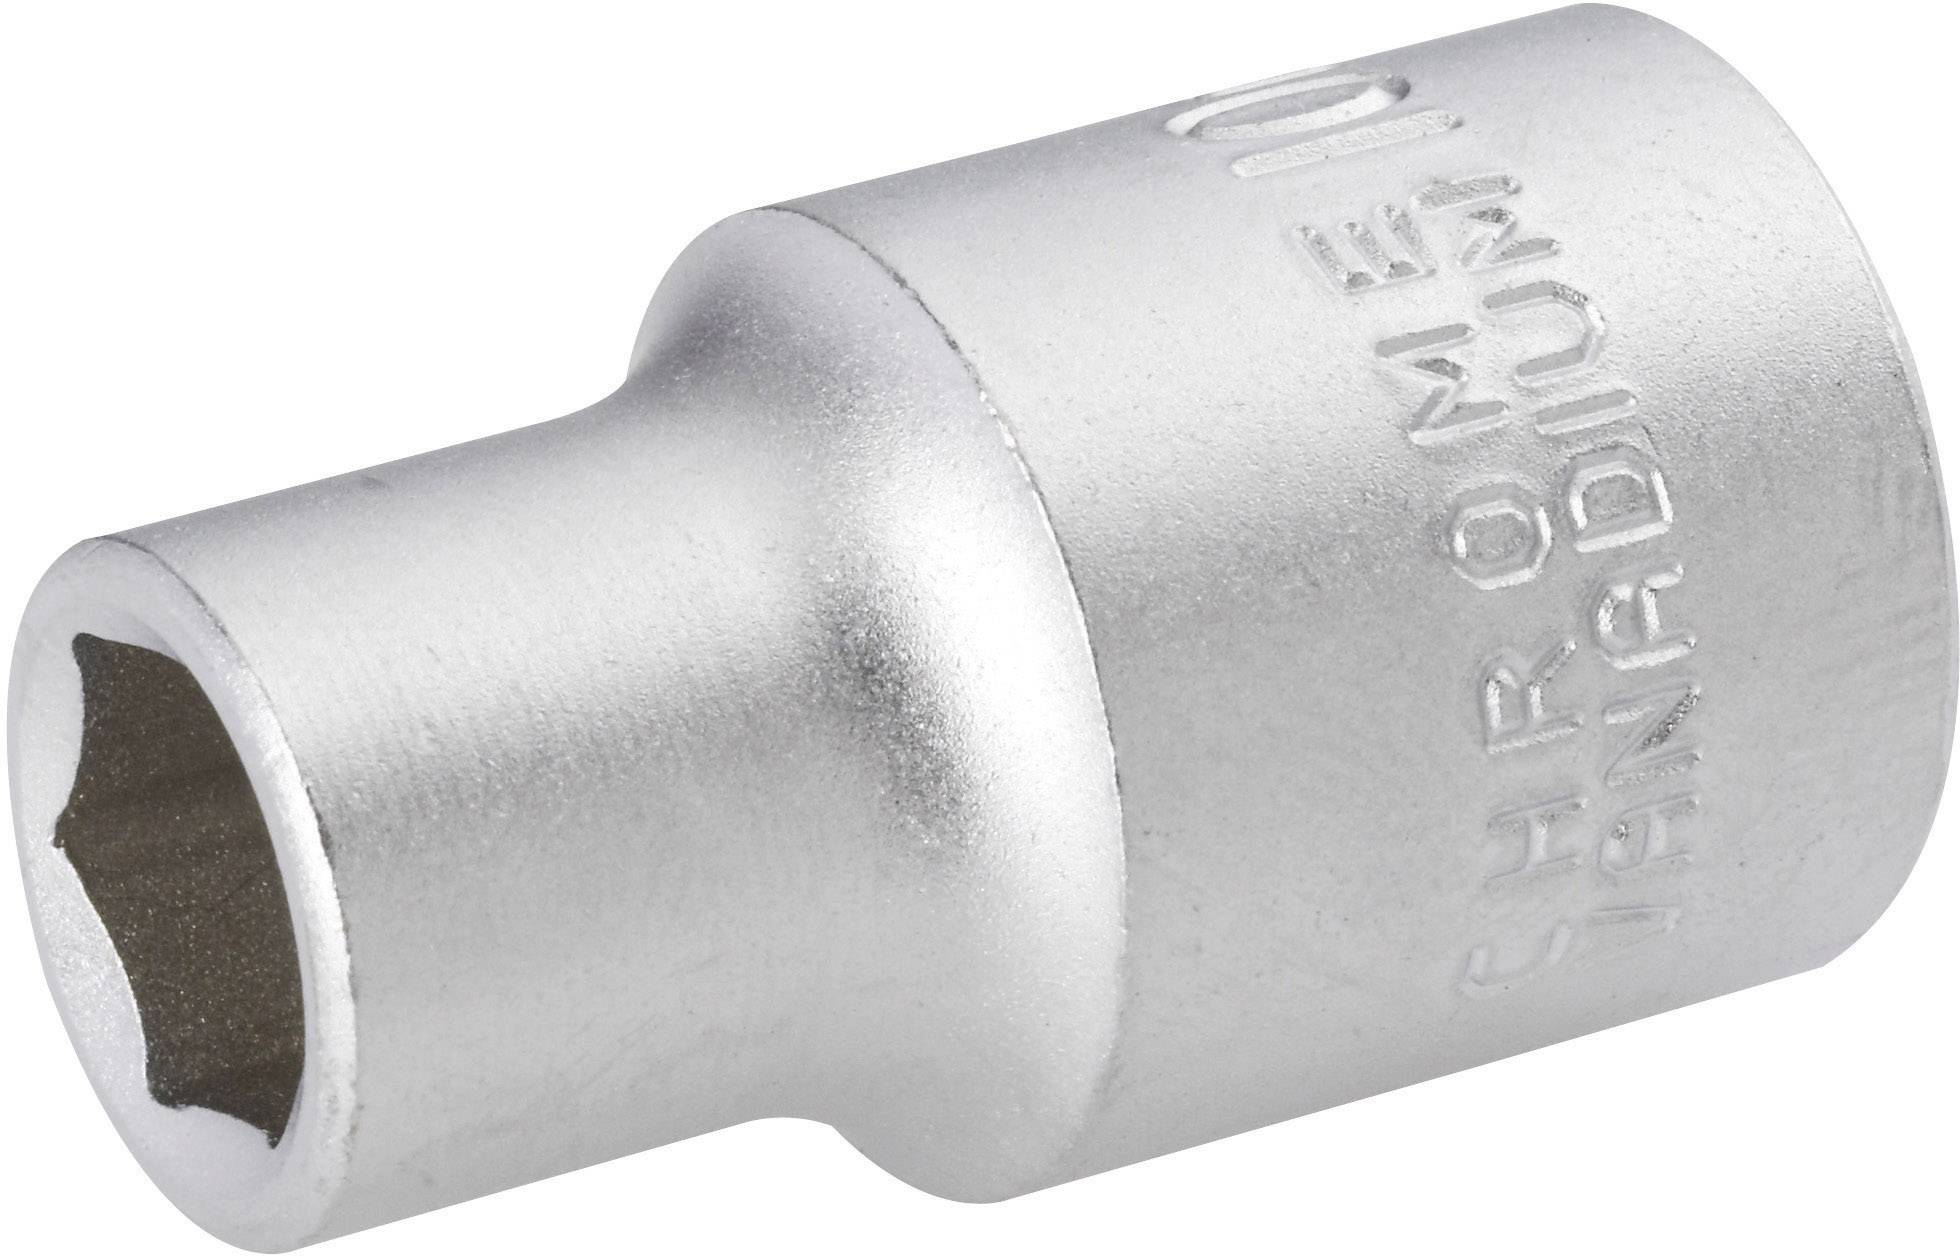 "Nadstavec na račňu TOOLCRAFT 820773, 1/2"" (12.5 mm), 19 mm"